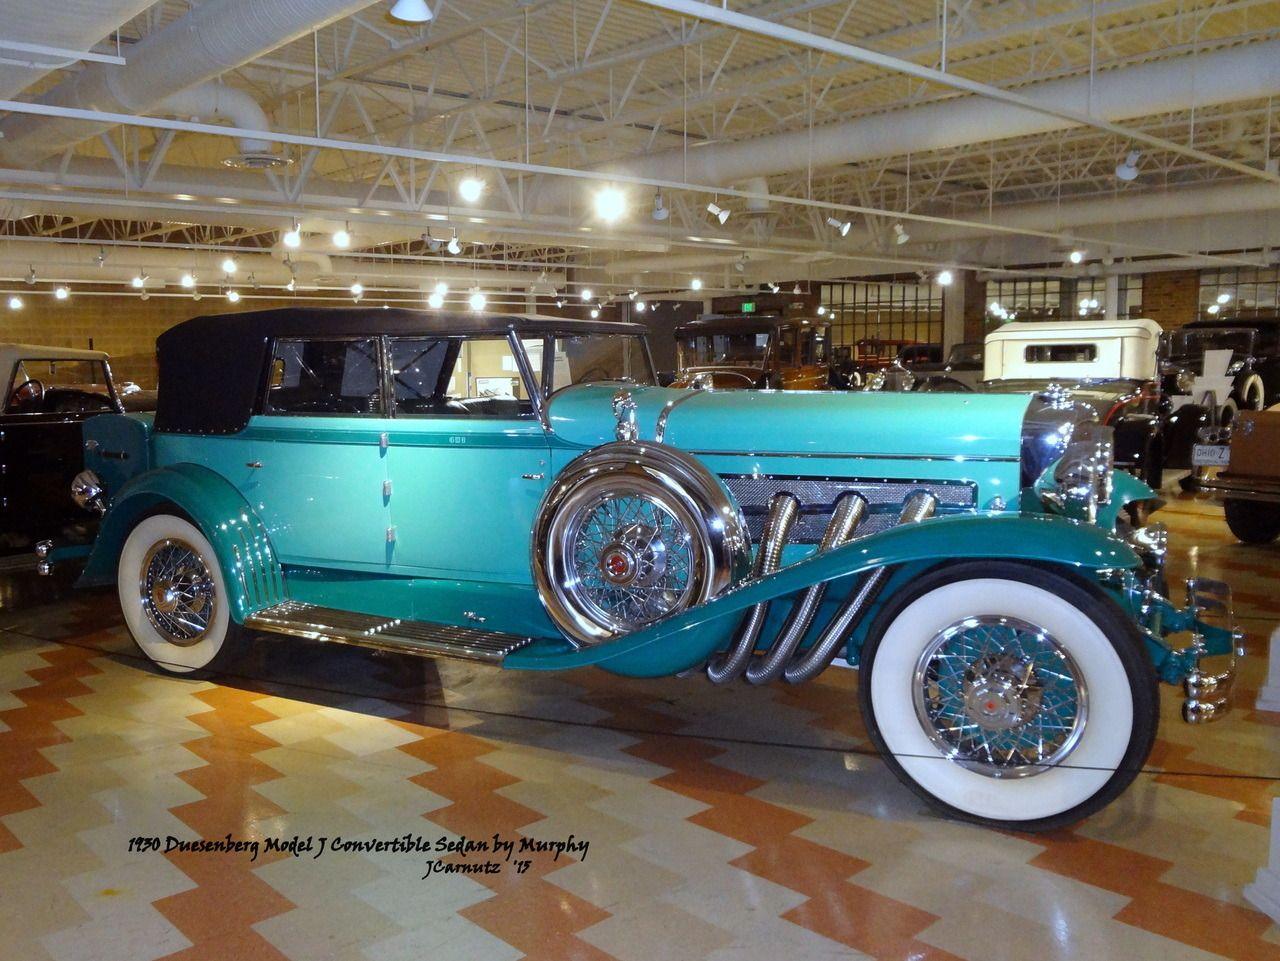 1930 Duesenberg Model J Convertible Sedan By Murphy 2015